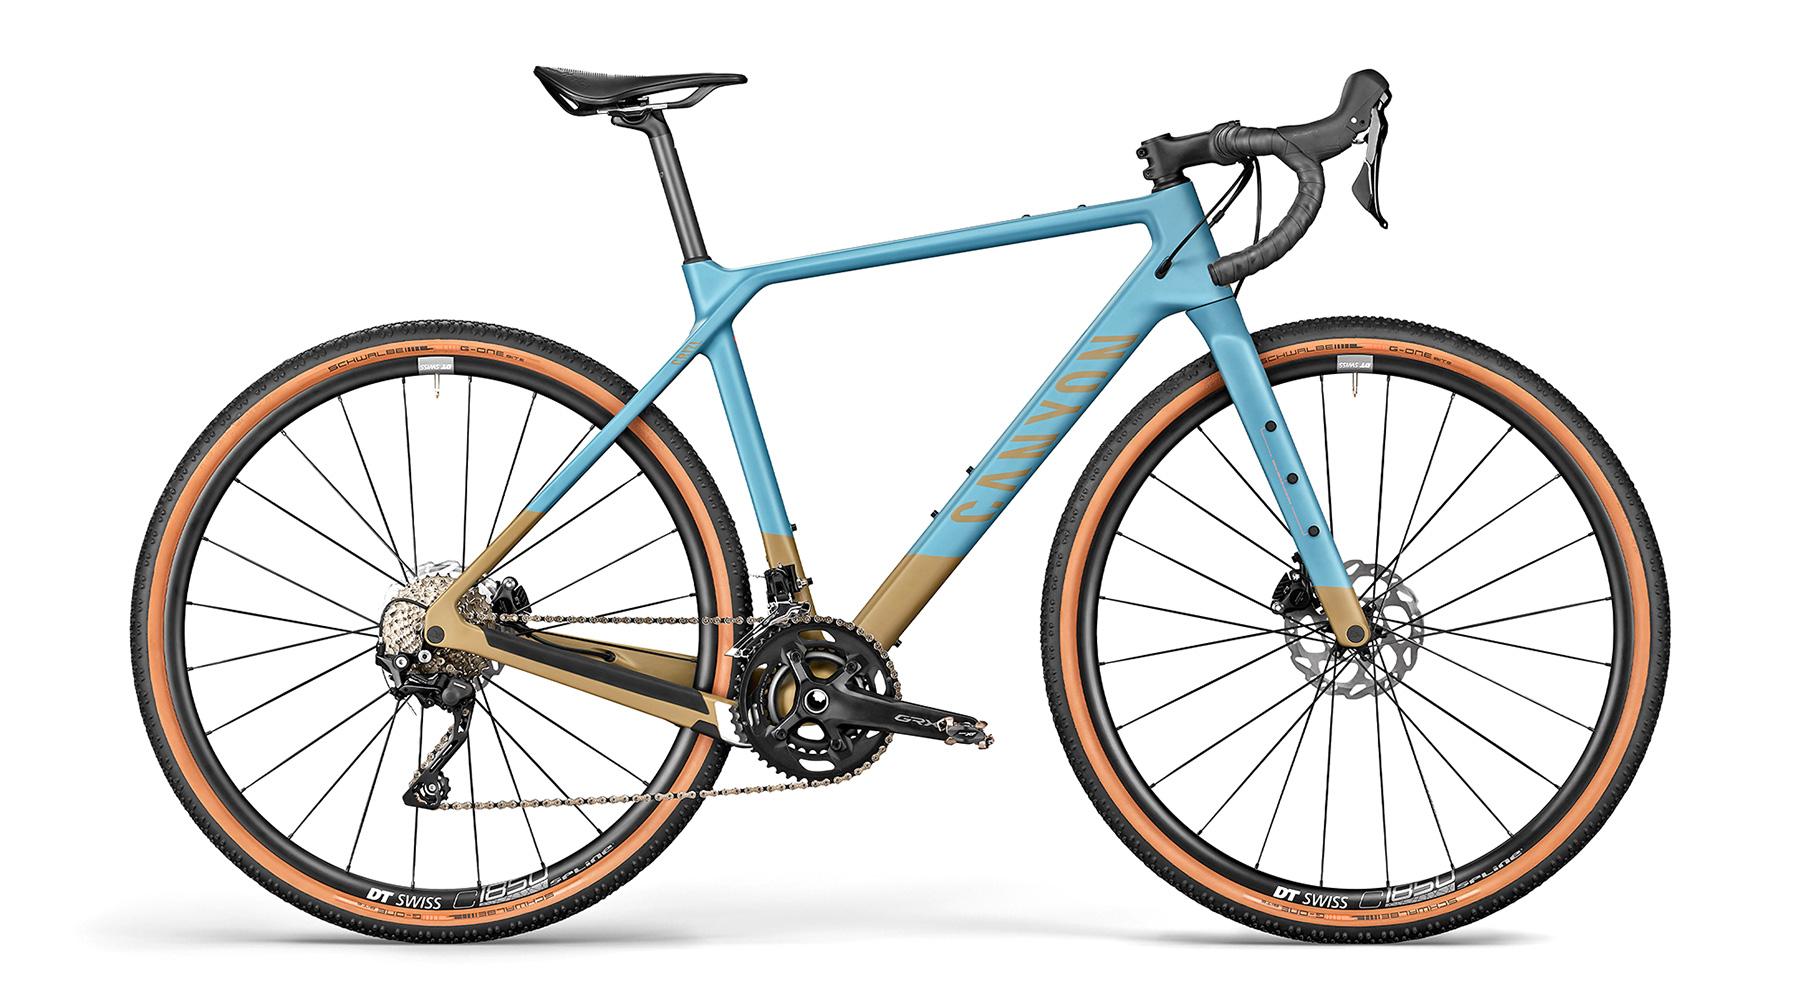 All-new 2021 Canyon Grizl carbon gravel bike bikepacking adventure, CF SL 6